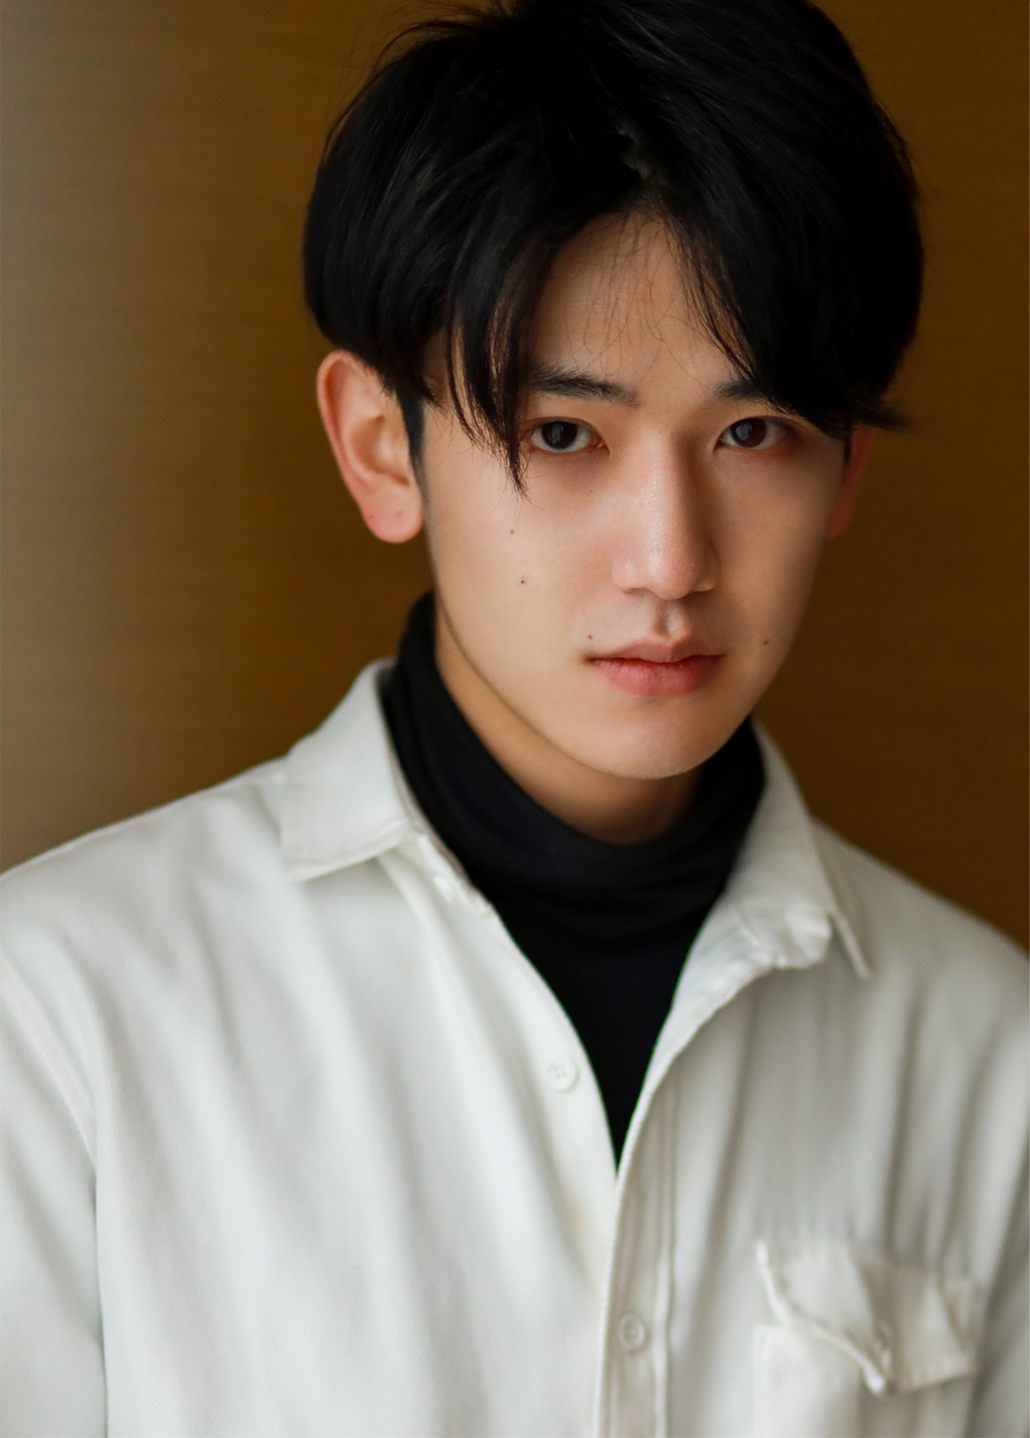 Guo Cheng